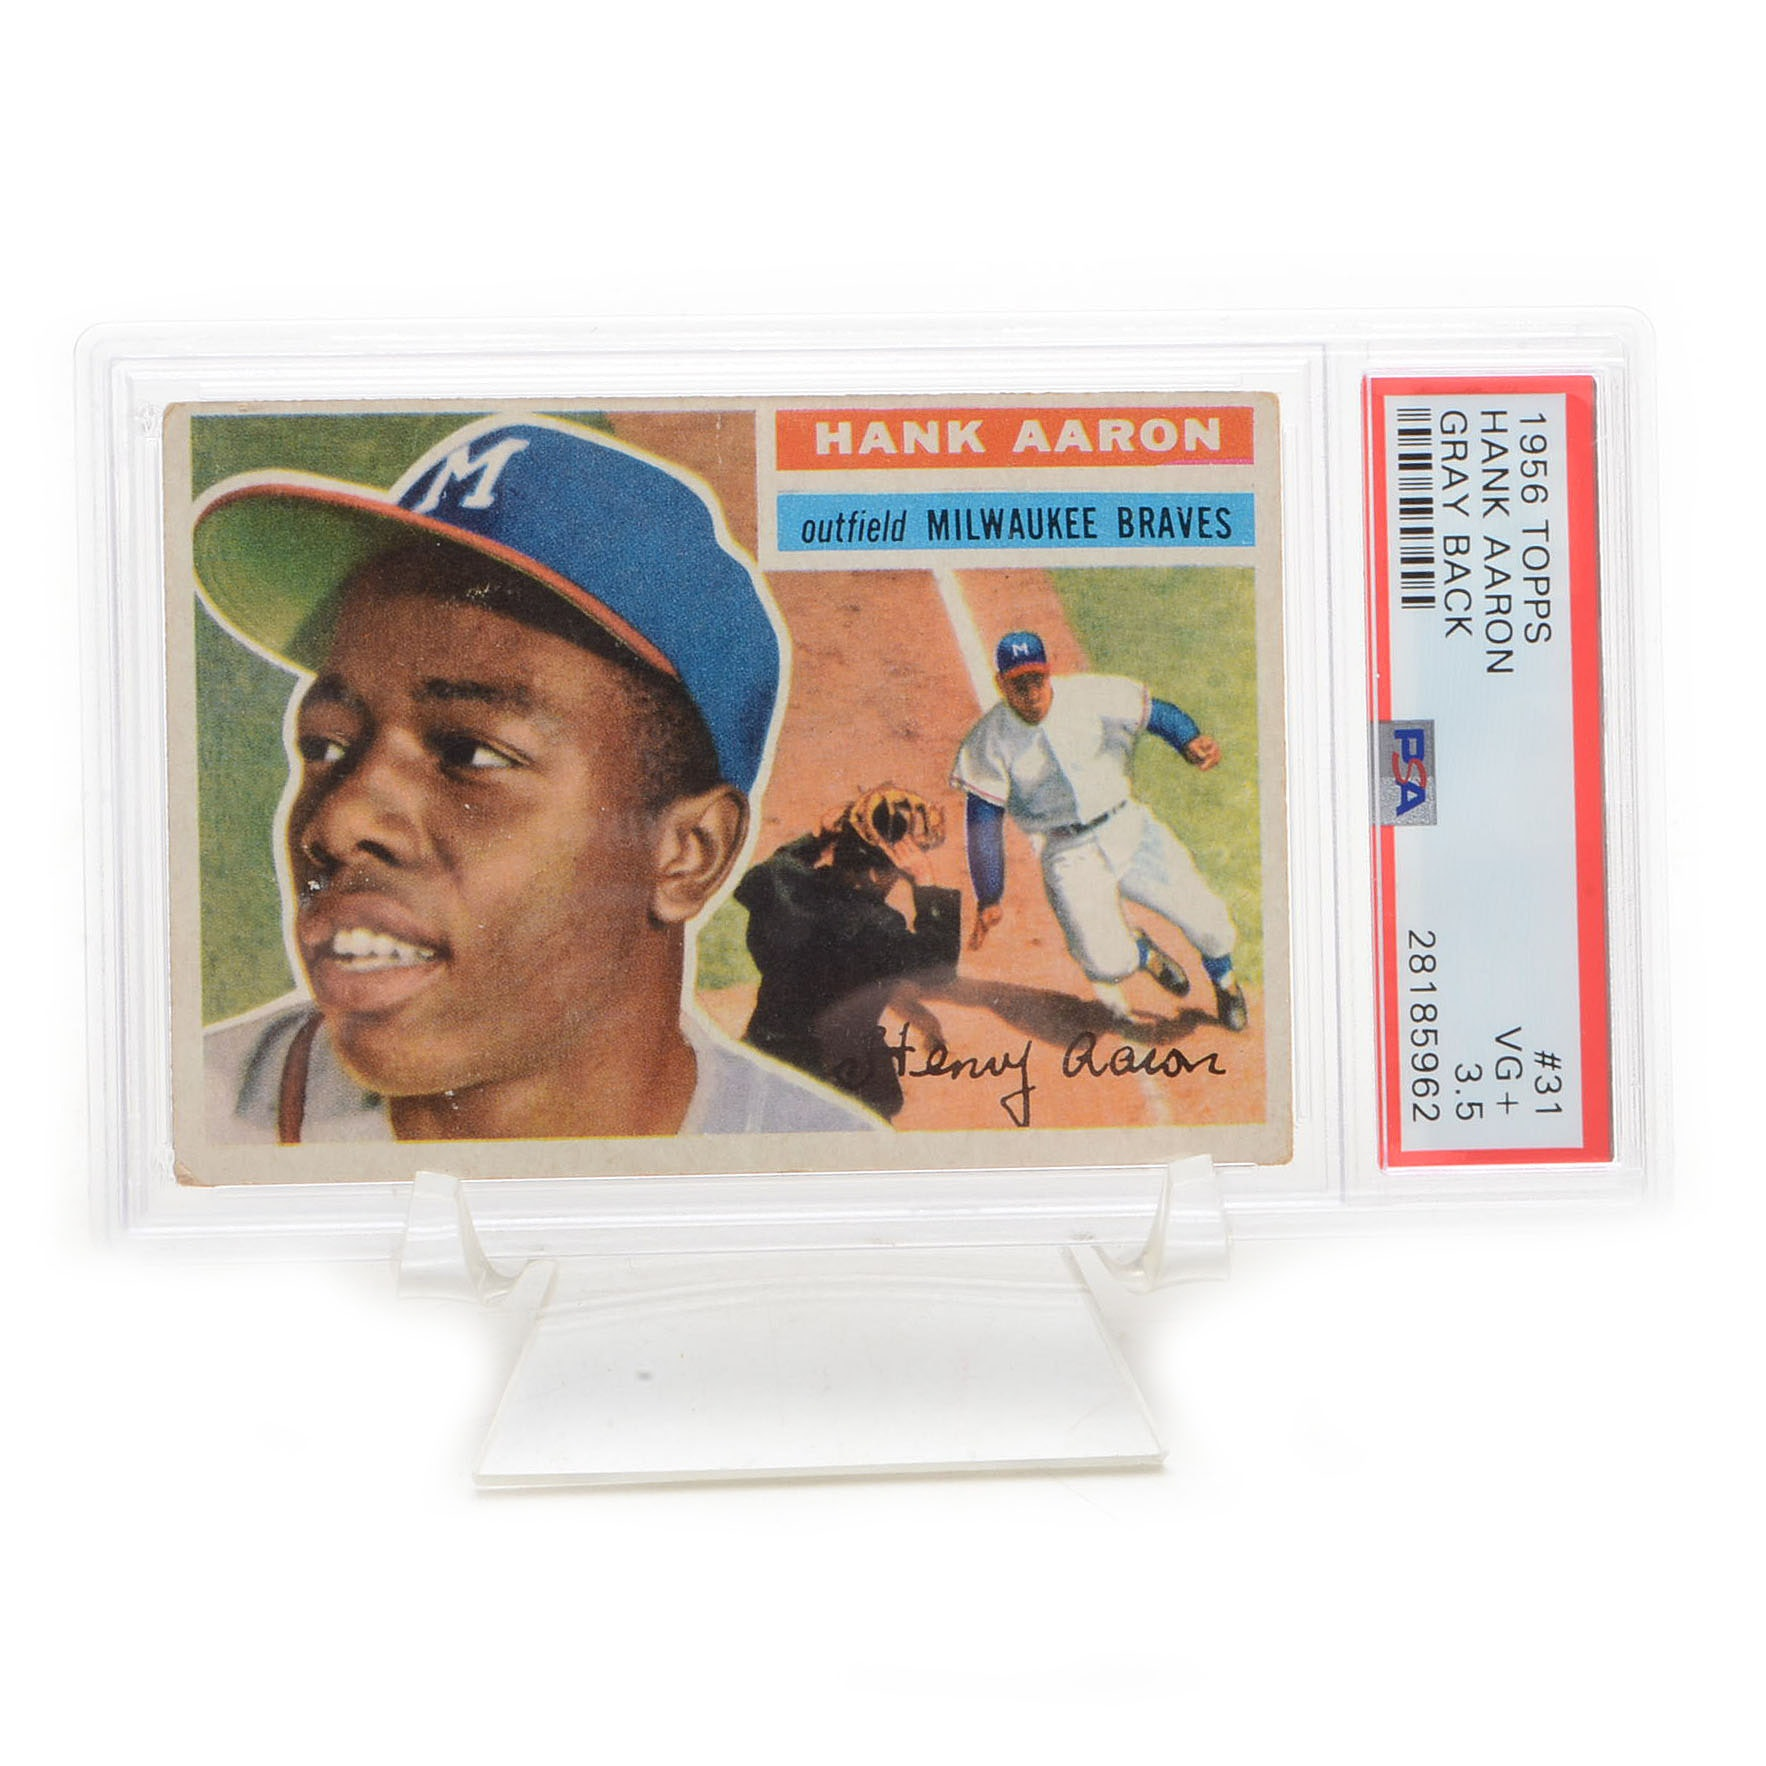 1956 Hank Aaron Topps PSA Graded Baseball Card